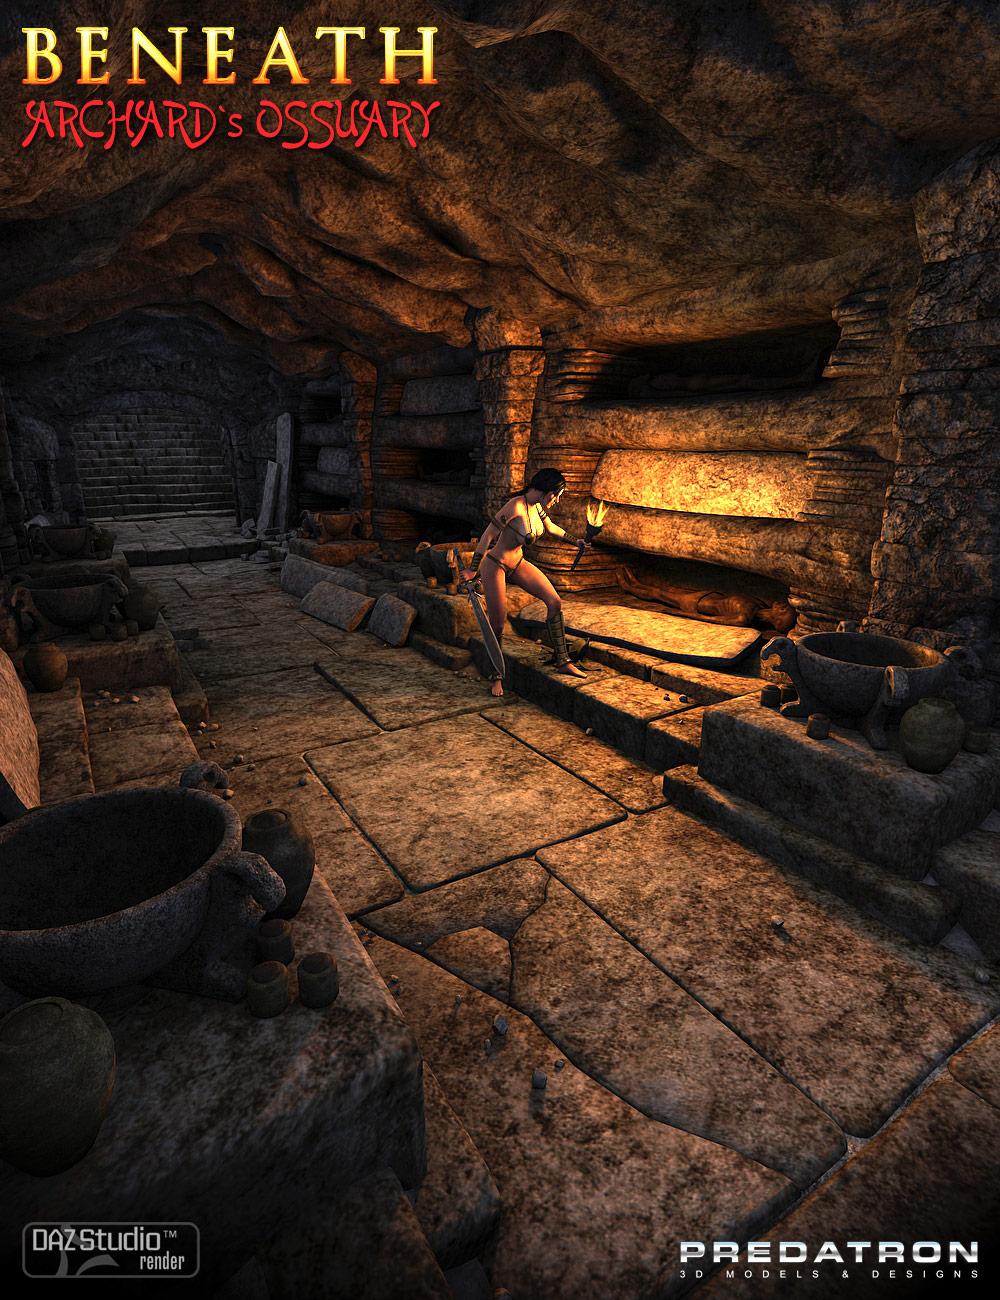 Beneath Archard's Ossuary by: Predatron, 3D Models by Daz 3D